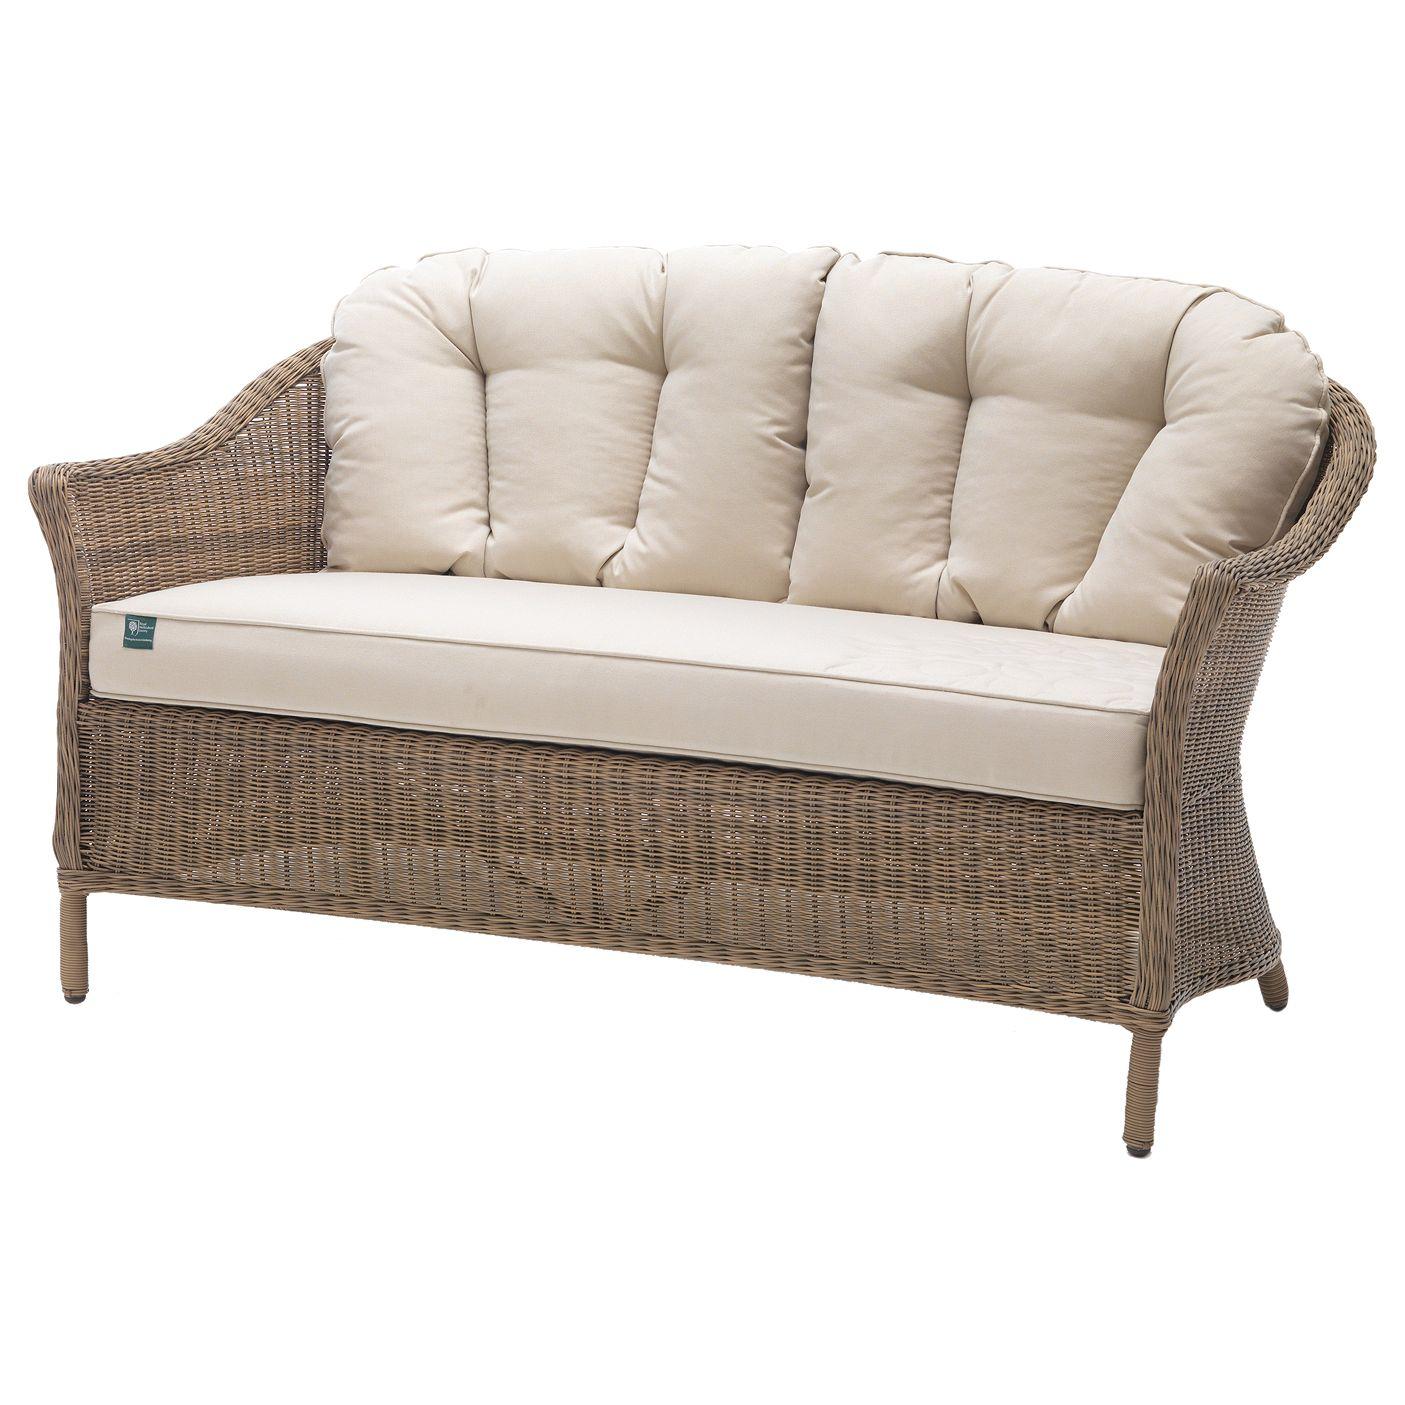 Kettler KETTLER RHS Harlow Carr 2 Seater Sofa, Natural